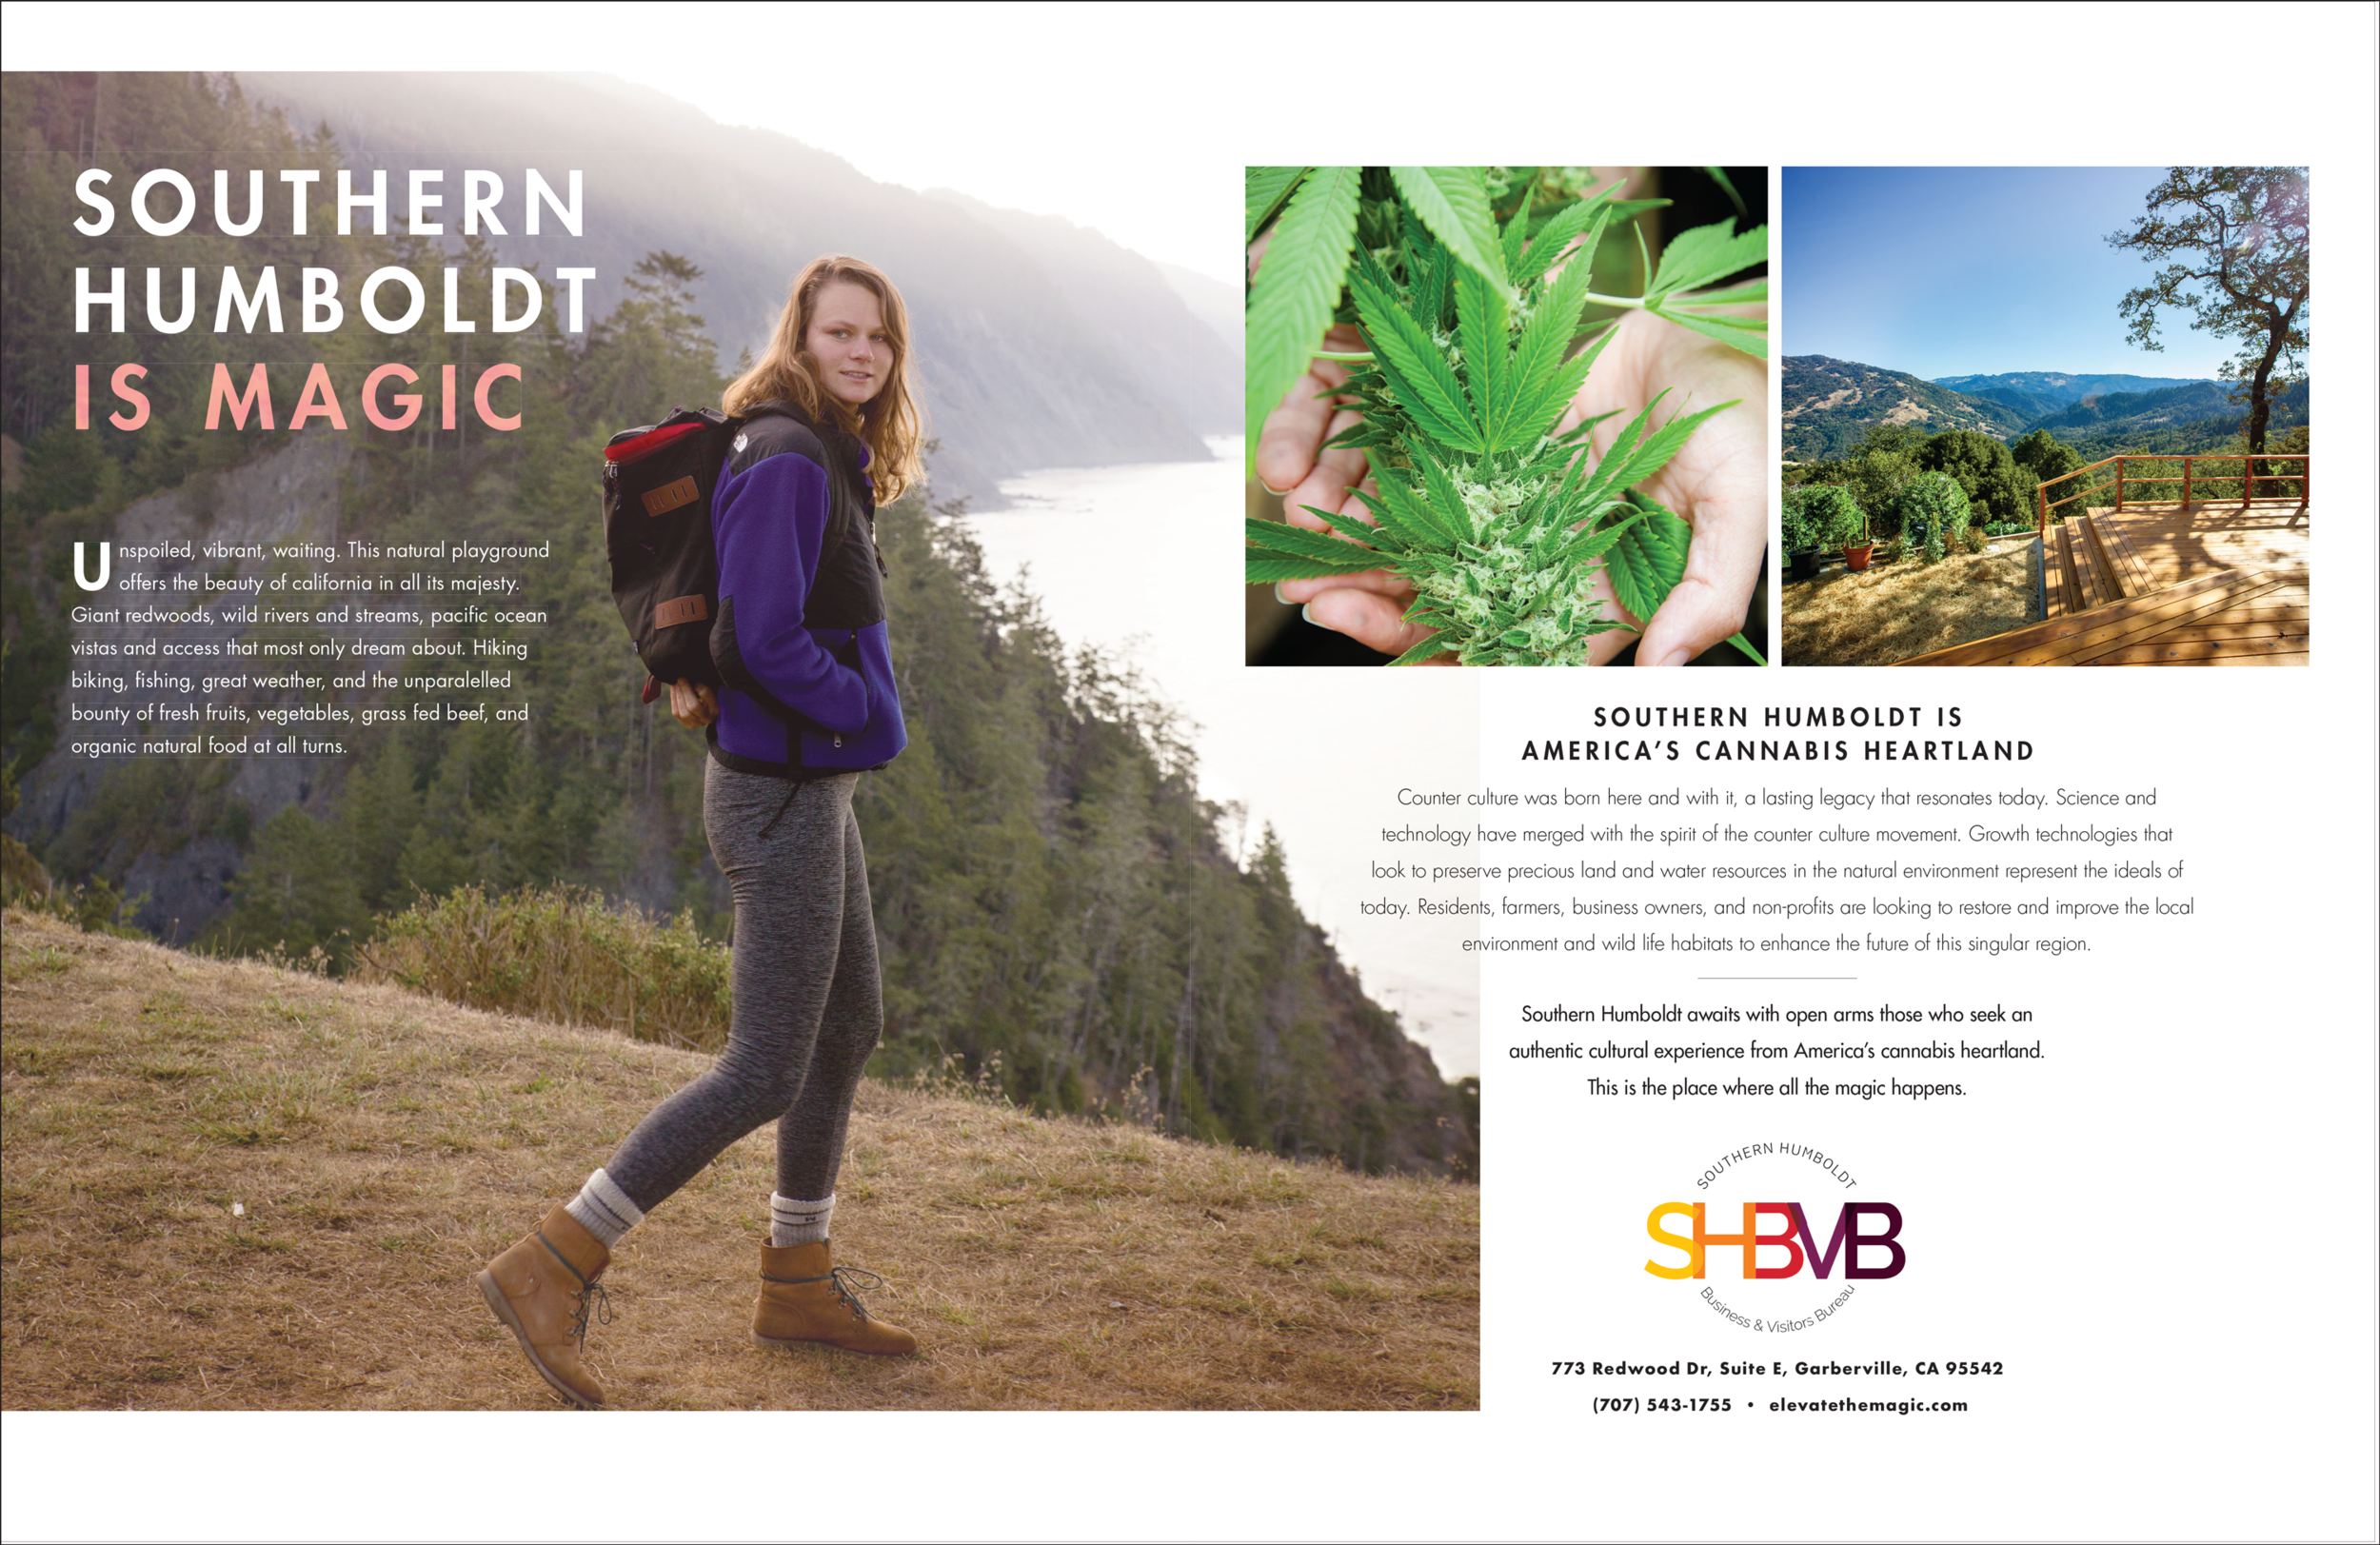 Southern Humboldt